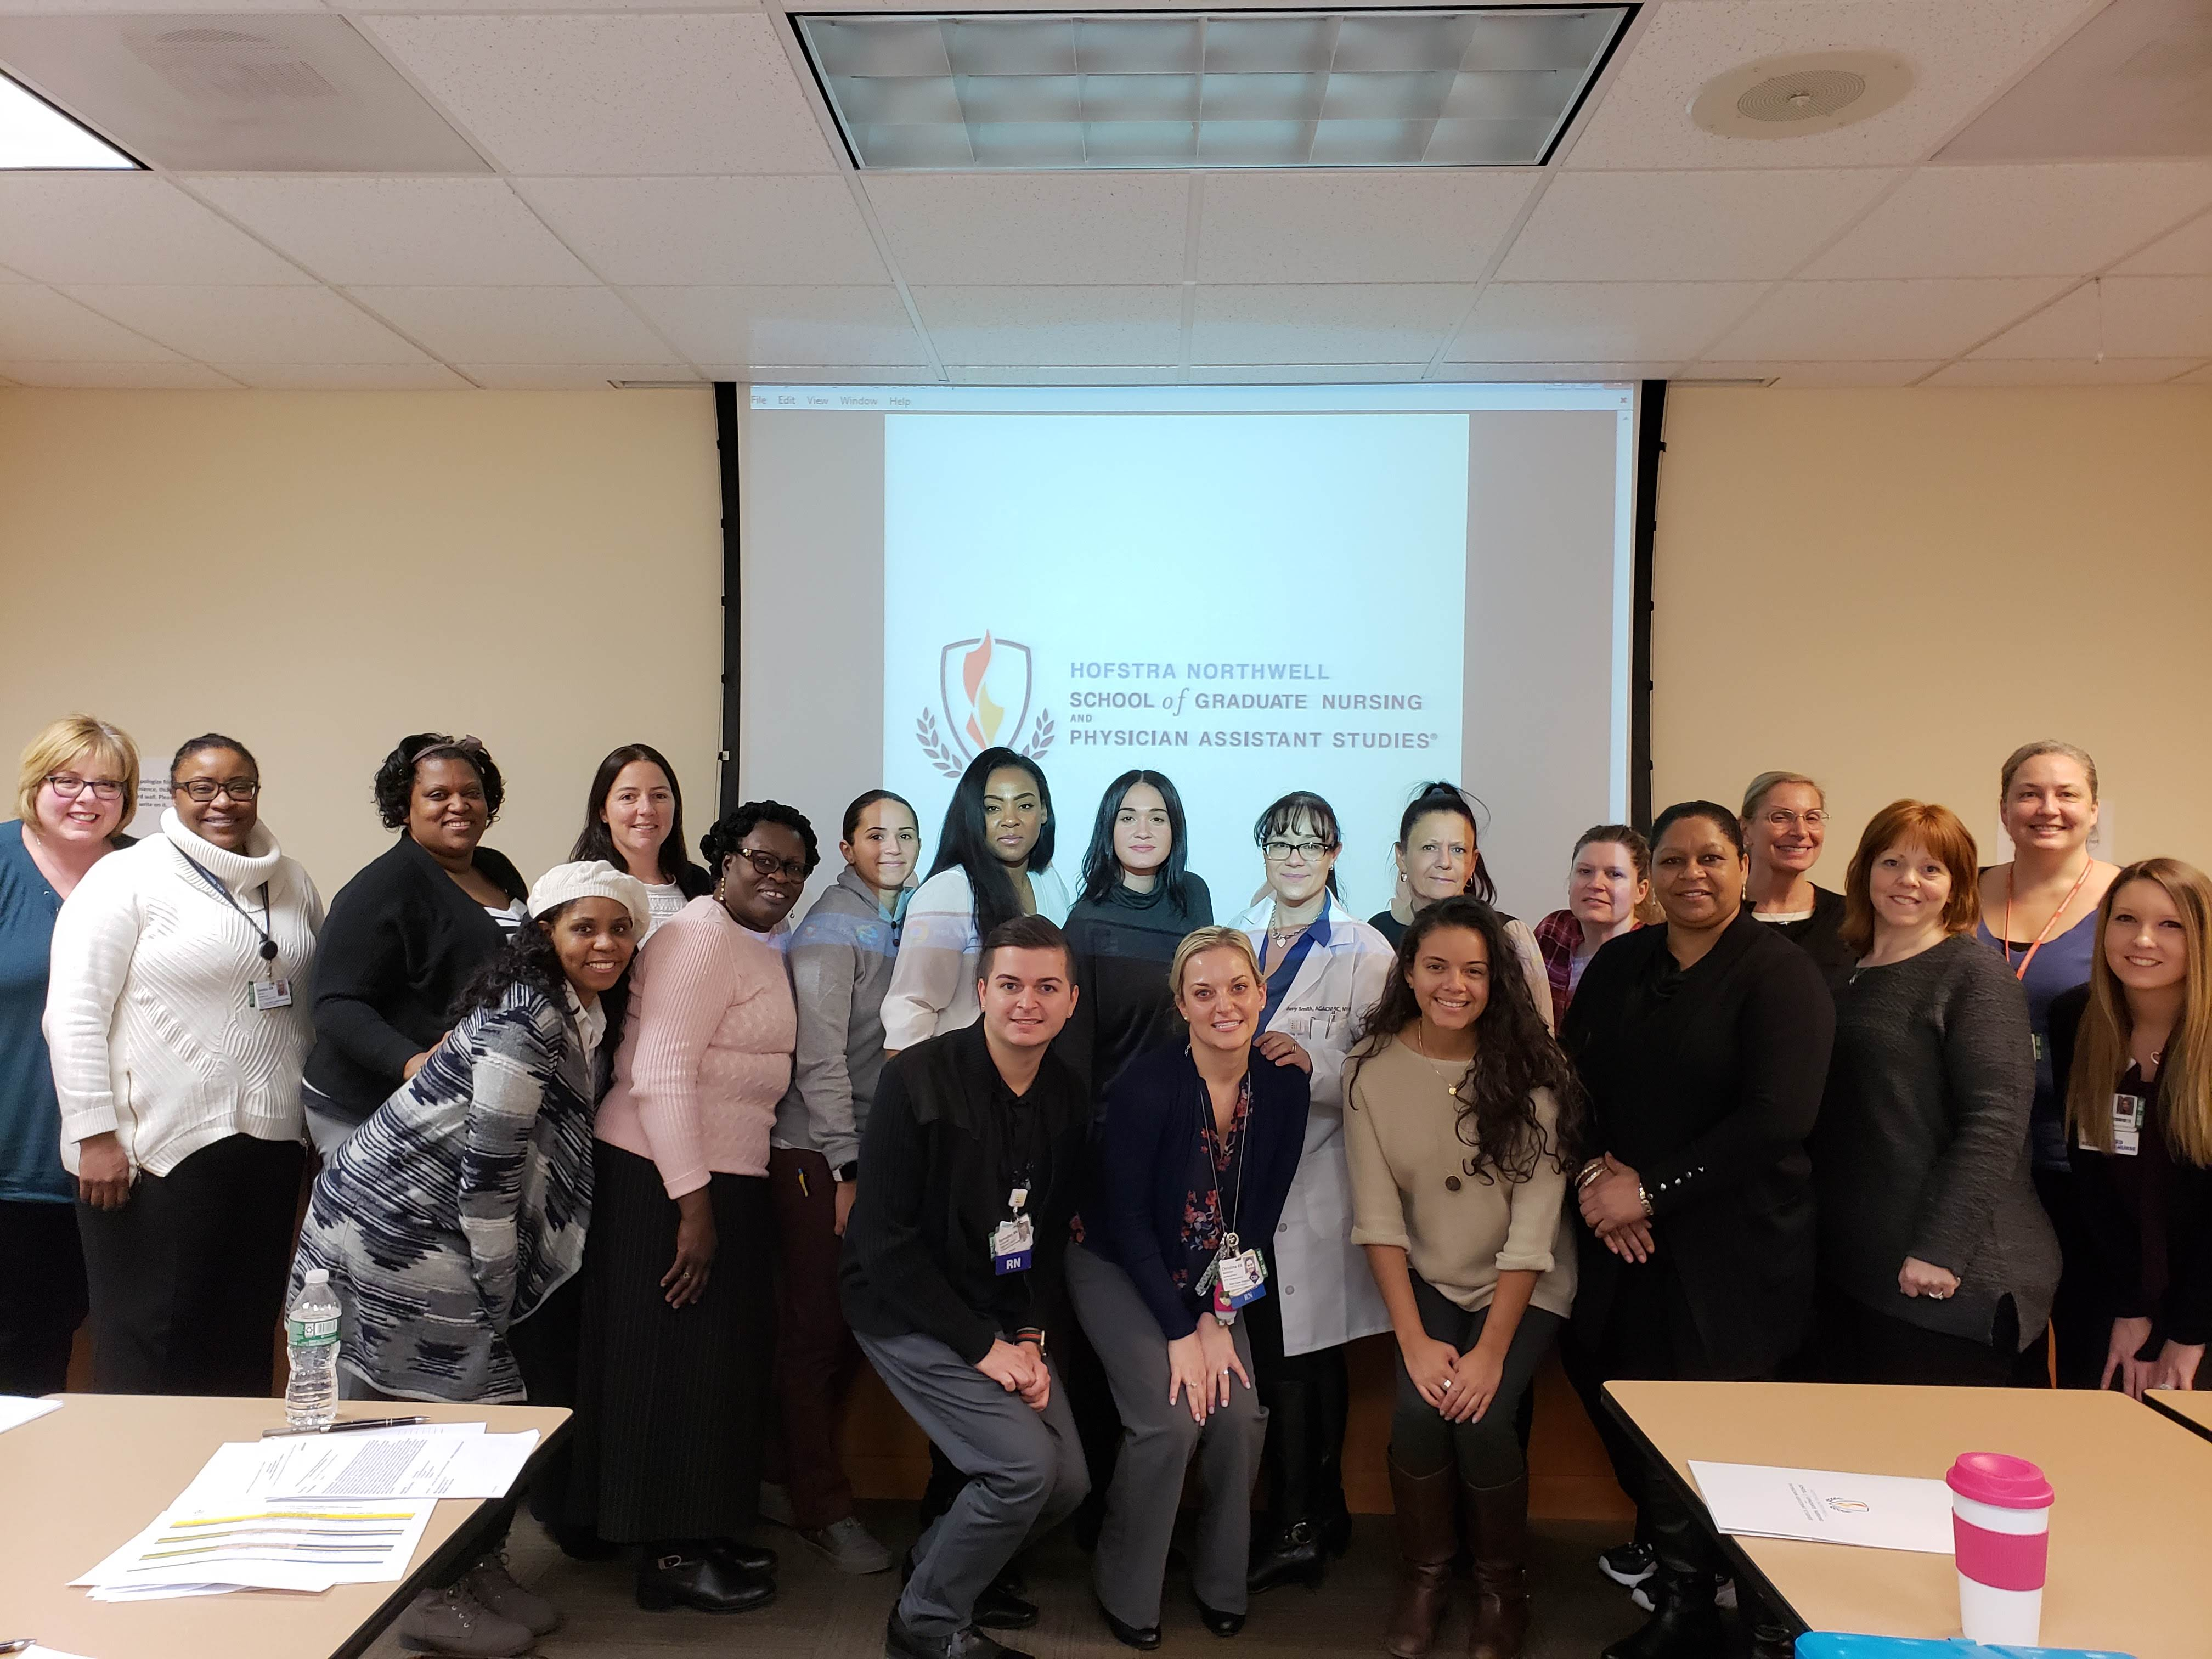 Hofstra and Northwel lSexual Assault Nurse Examiner Program